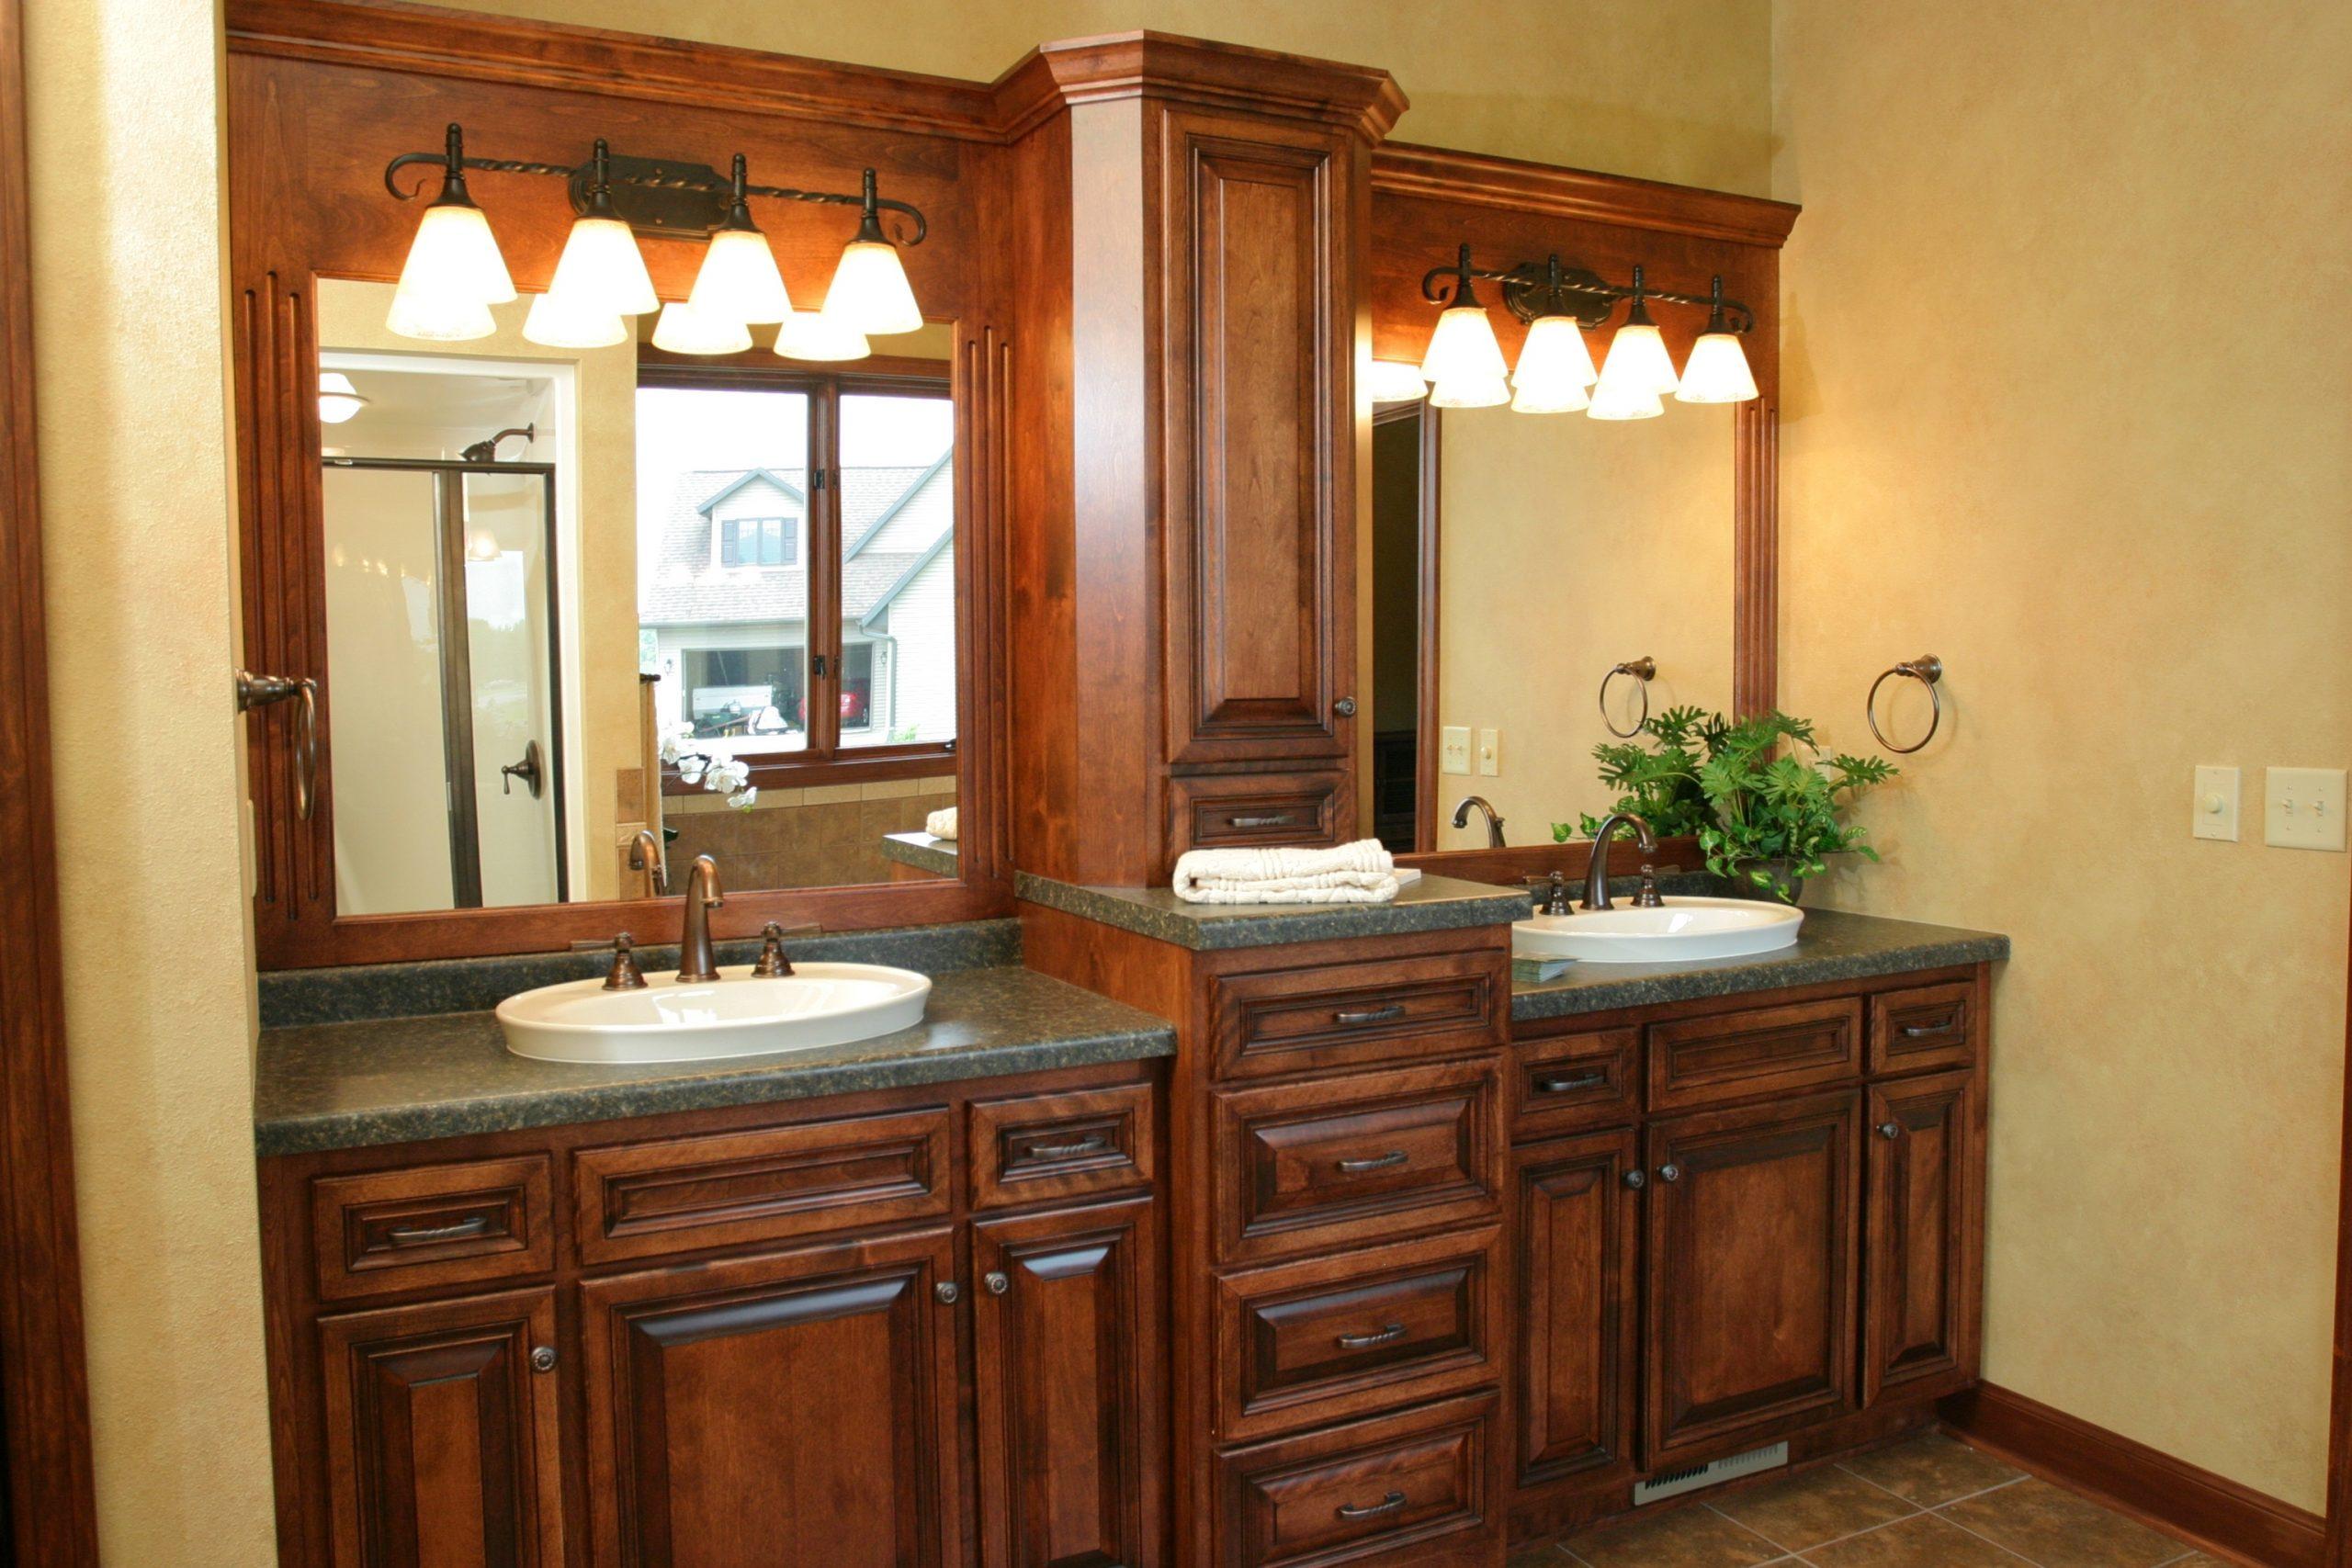 Kitchen Bathroom Cabinets Near Me - Kitchen and Bath